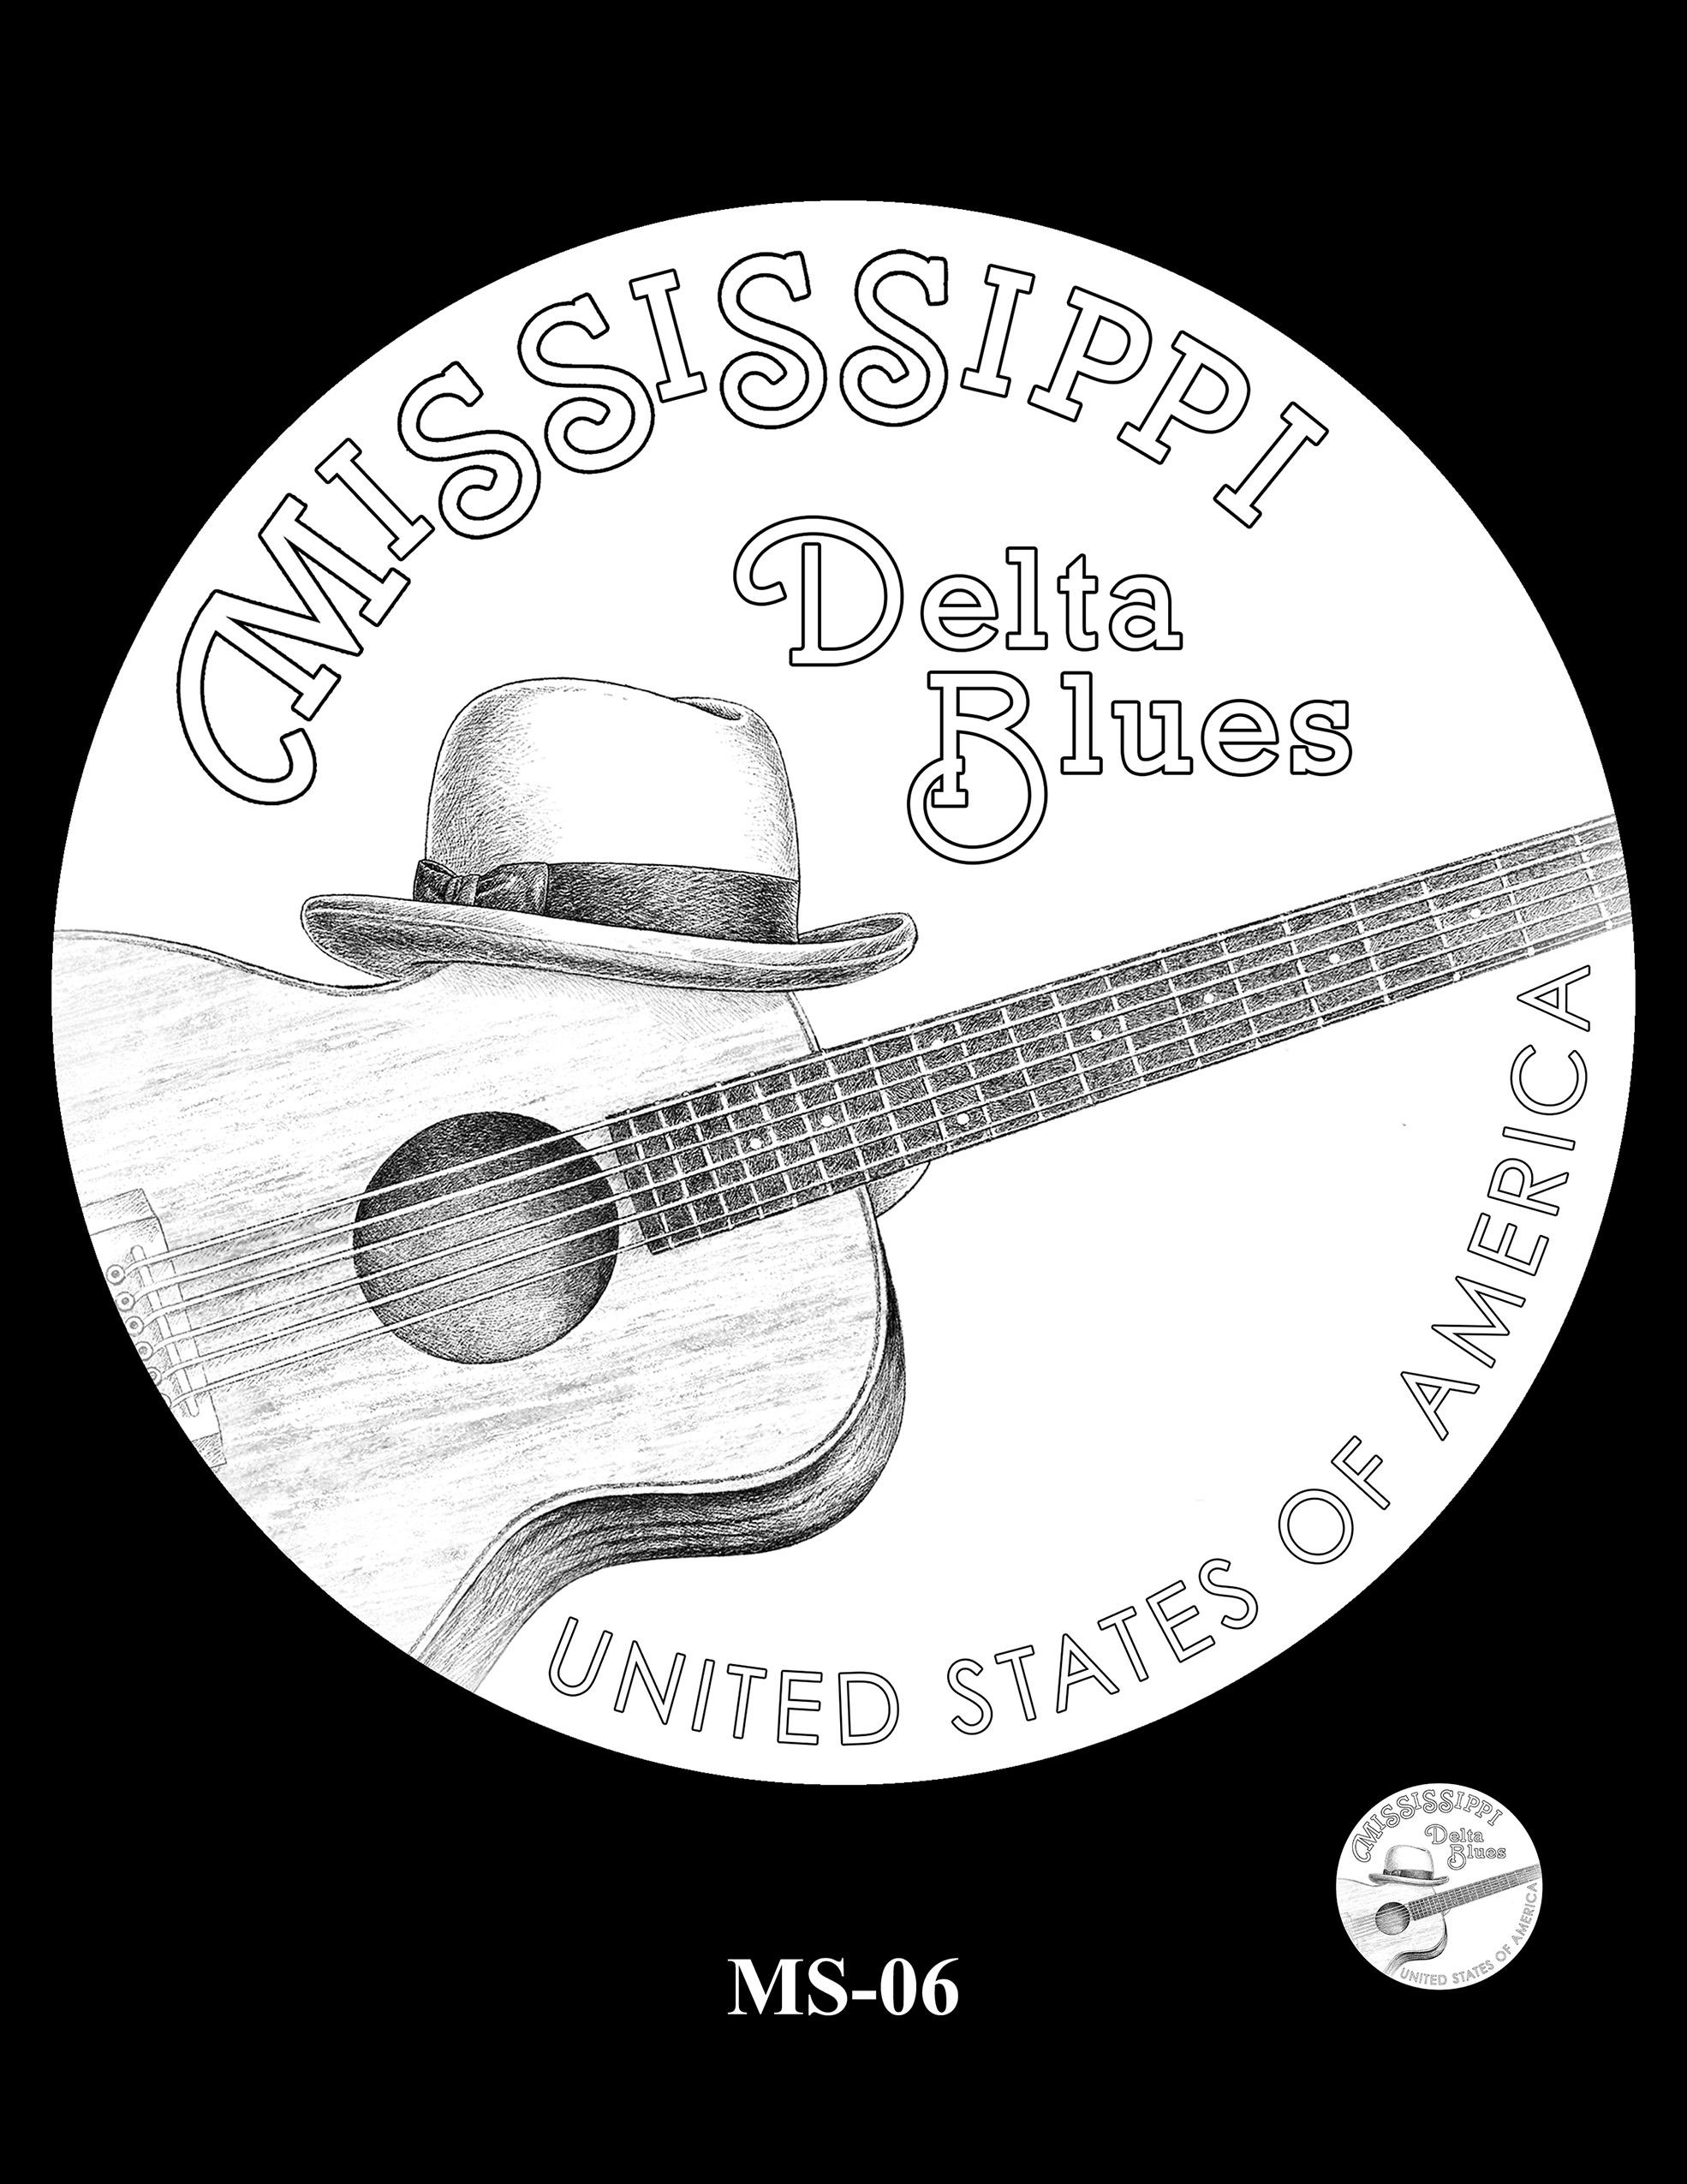 MS-06 -- 2023 American Innovation $1 Coin Program - Mississippi